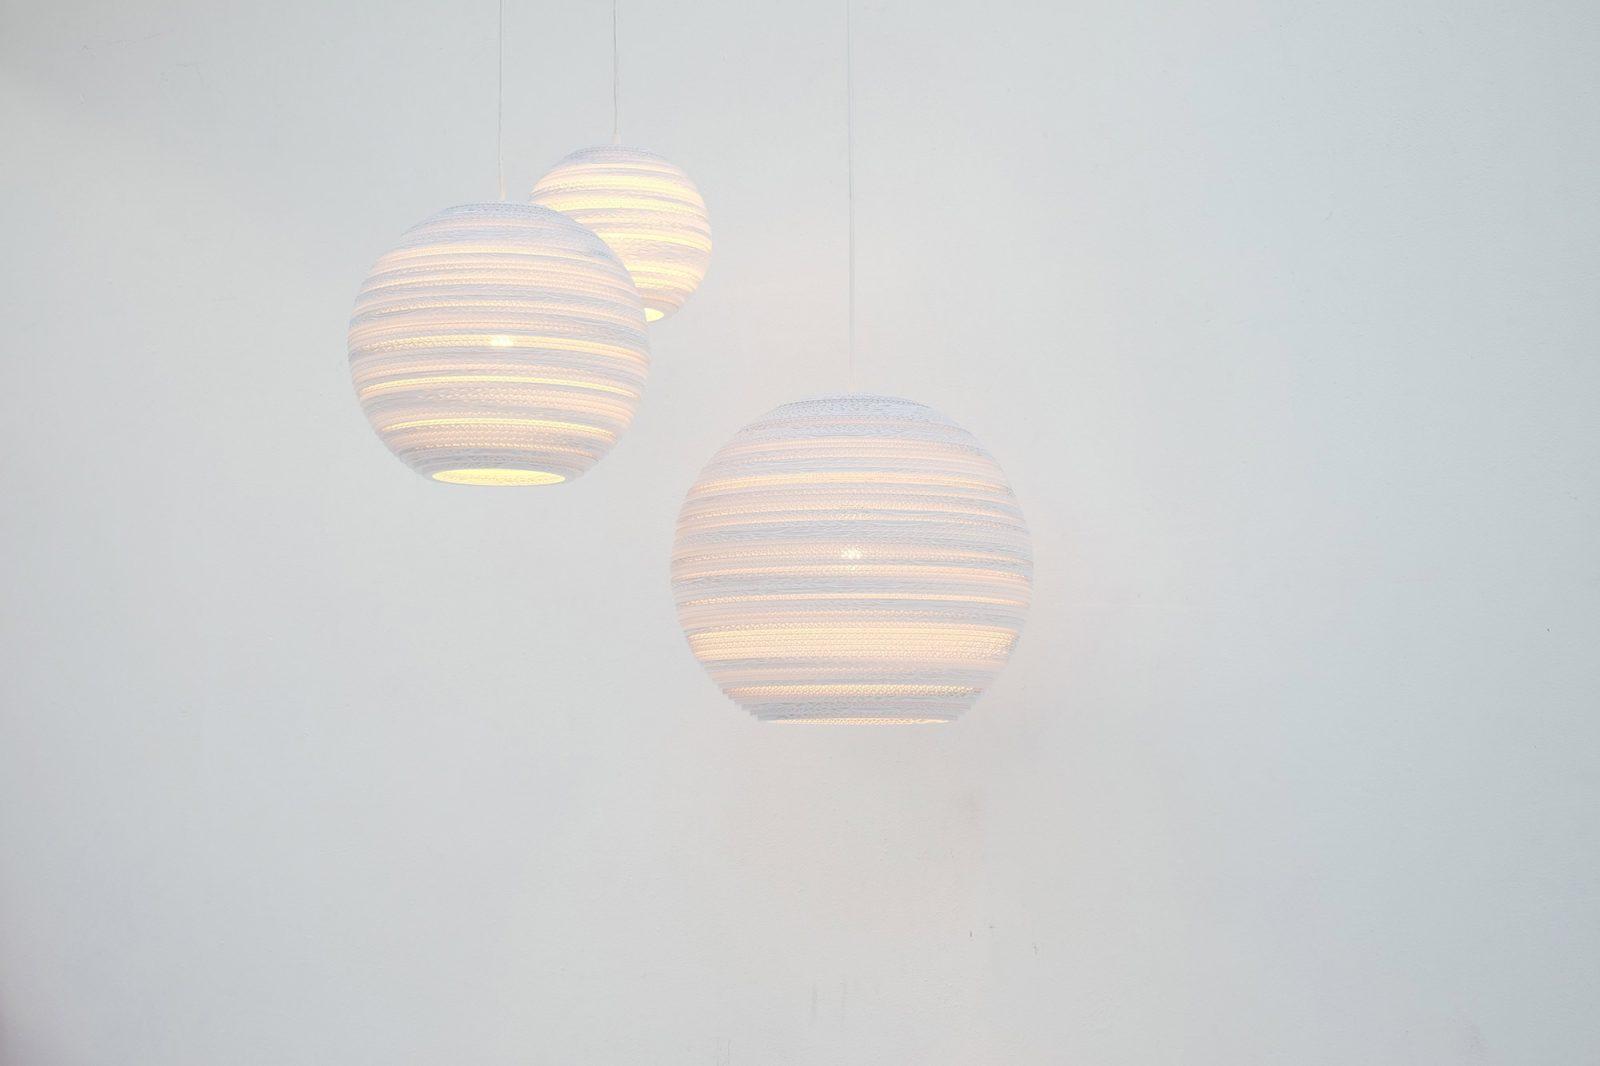 Moon 10 Scraplight White Pendant Light-31520